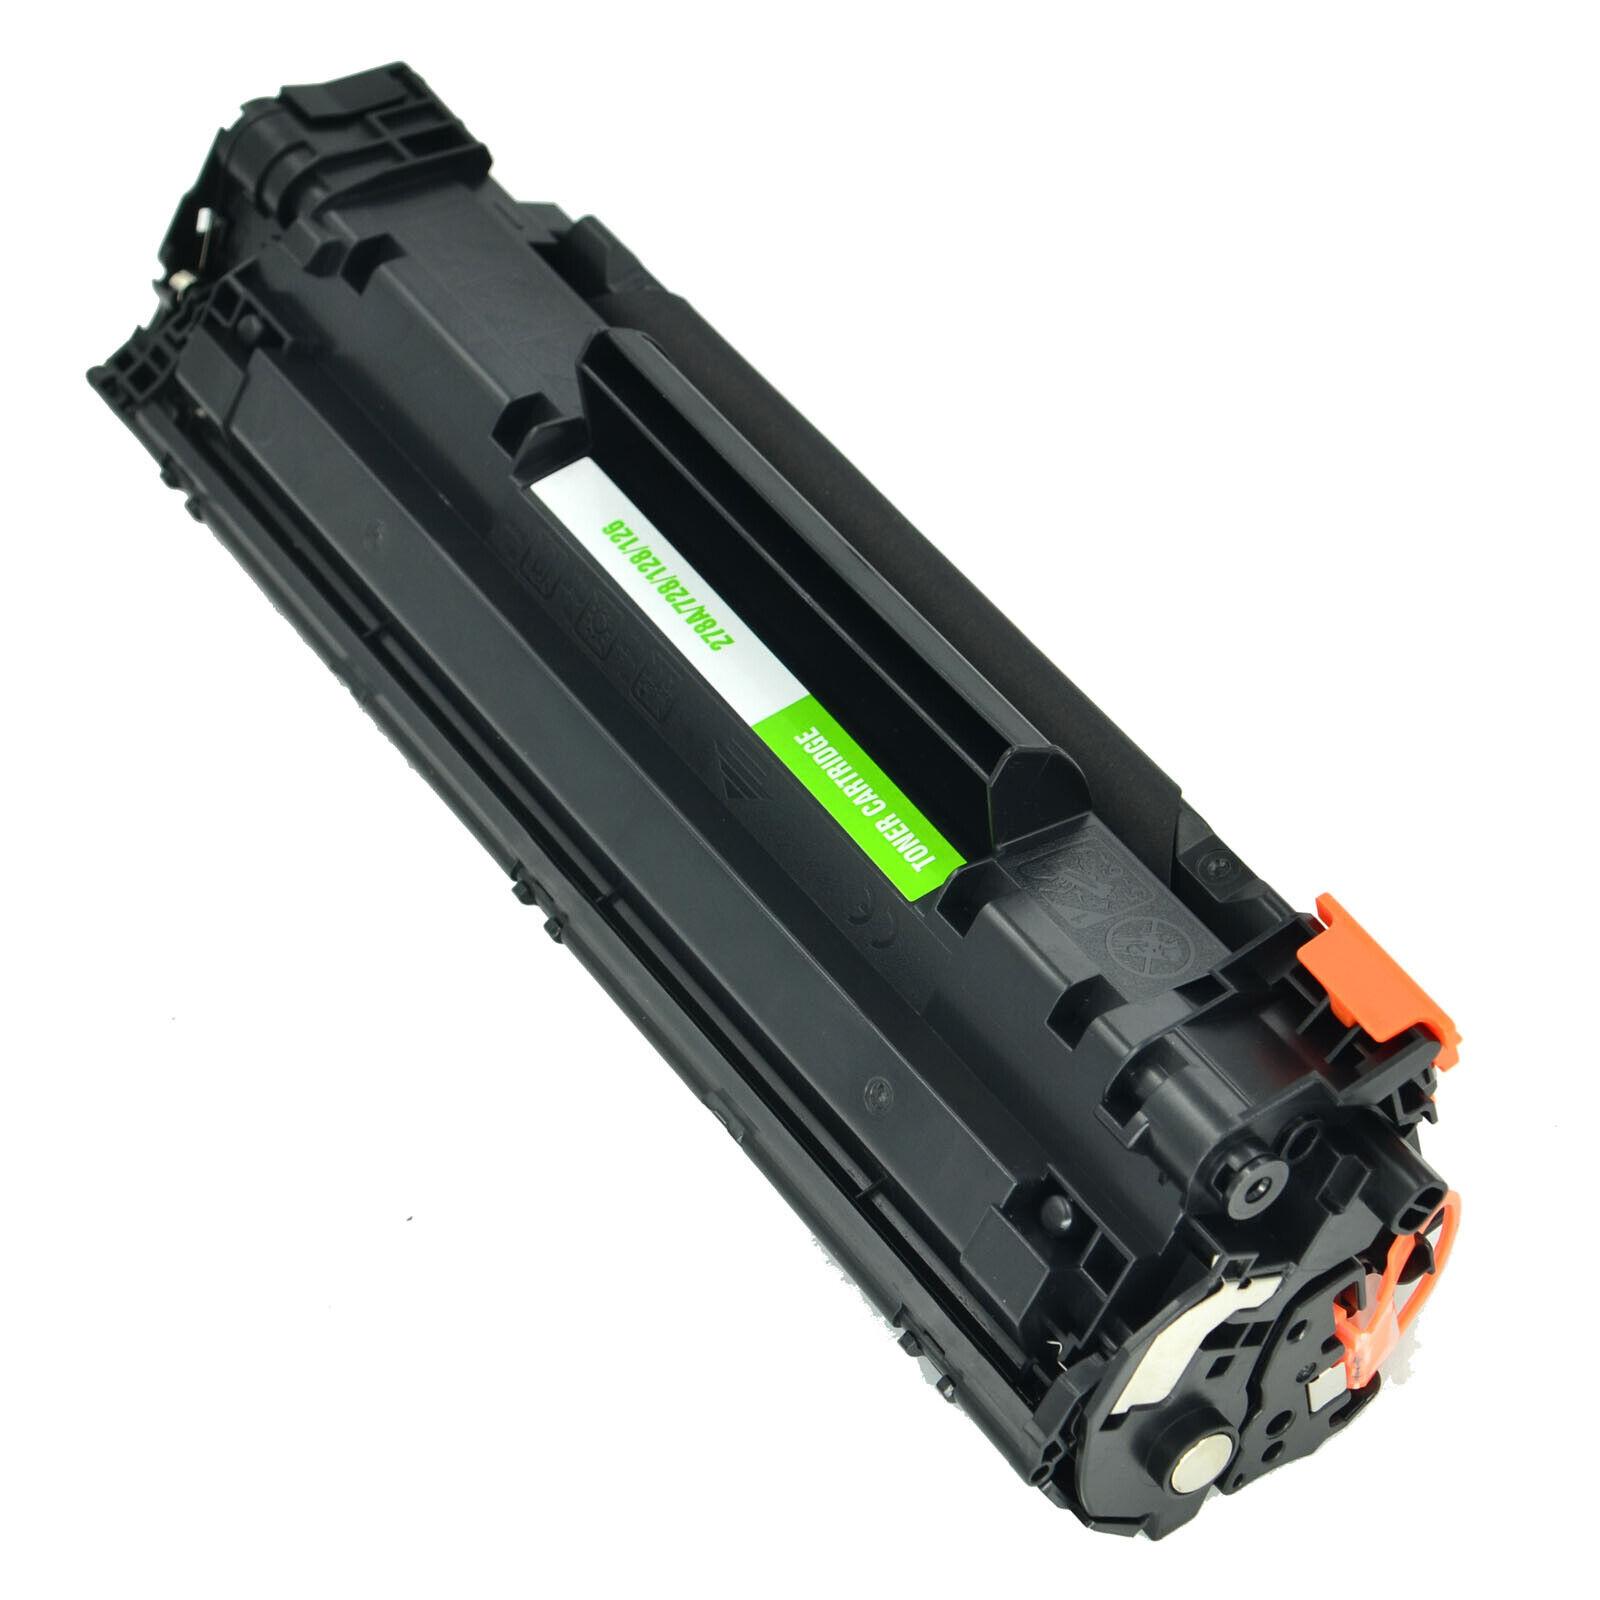 1pk Crg128 3500b001aa Black Toner Cartridge For Canon 128 Imageclass